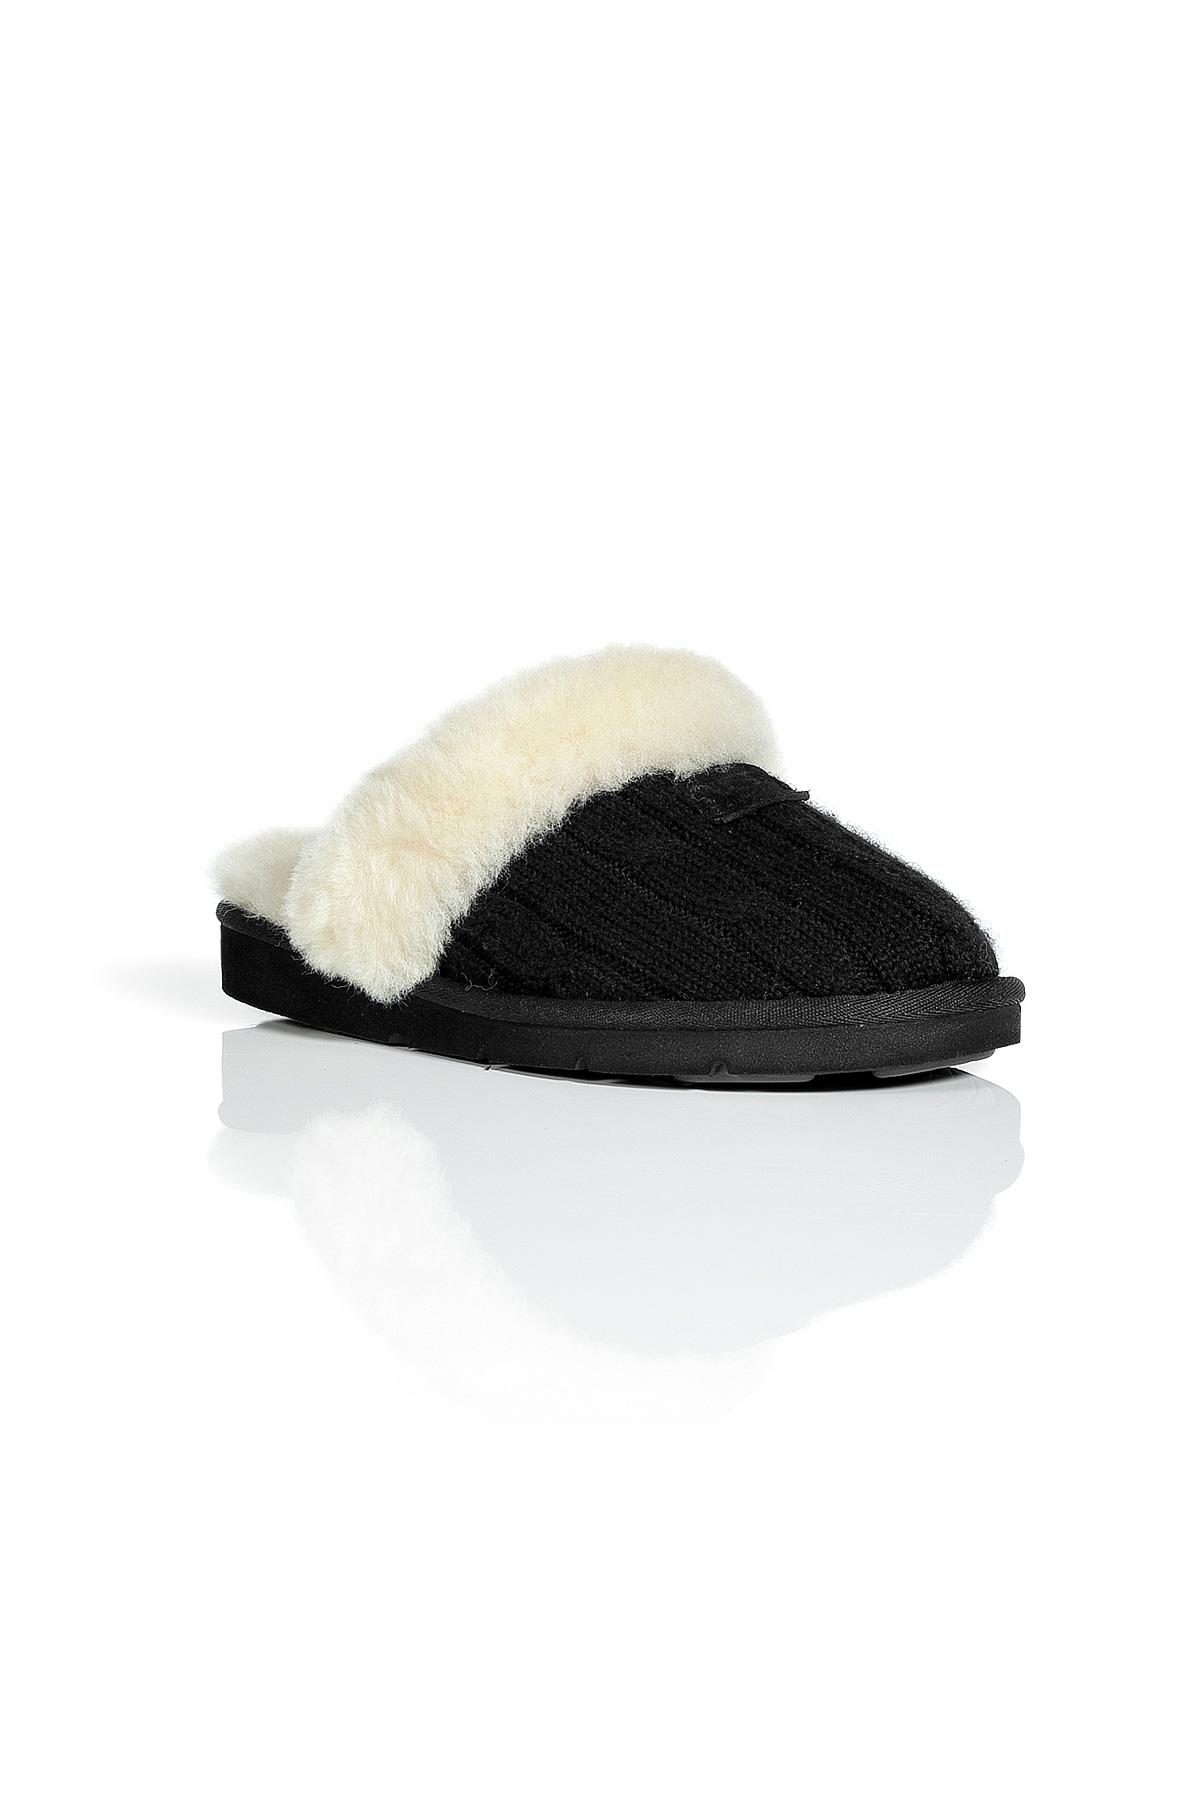 ugg knit hats sale